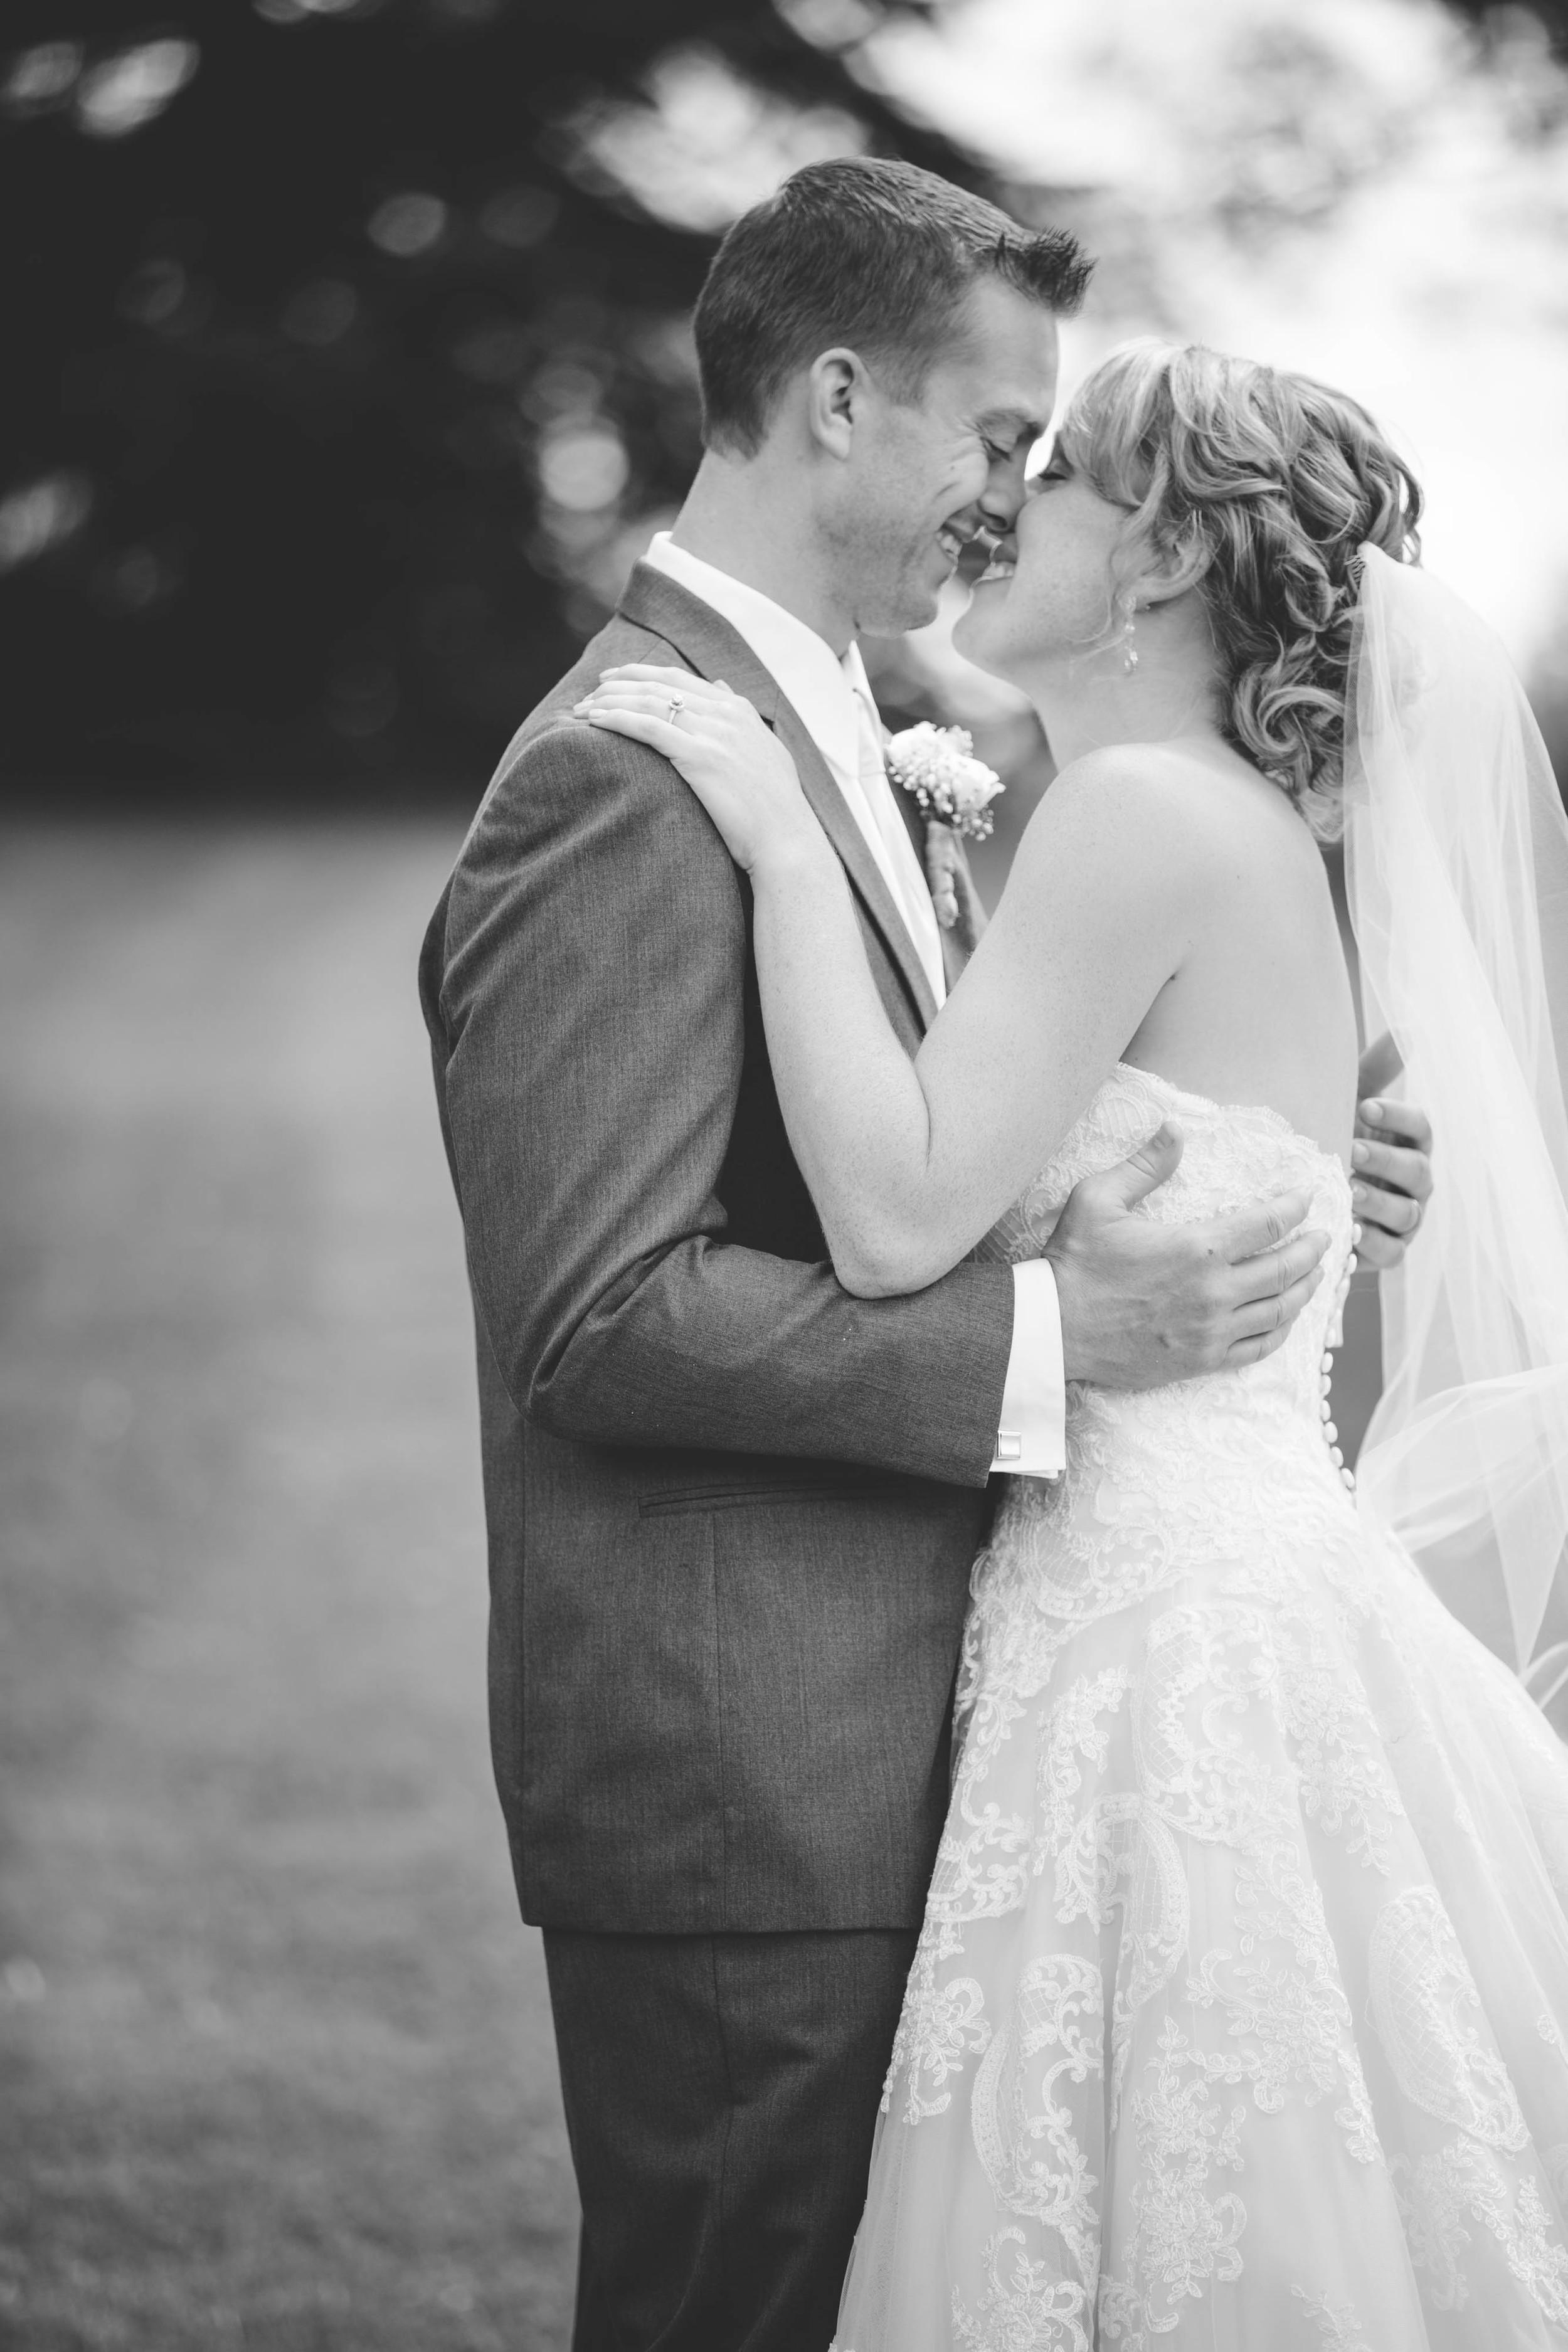 #mnwedding #mnphotographer #countrycharm #brideandgroom #firstlook